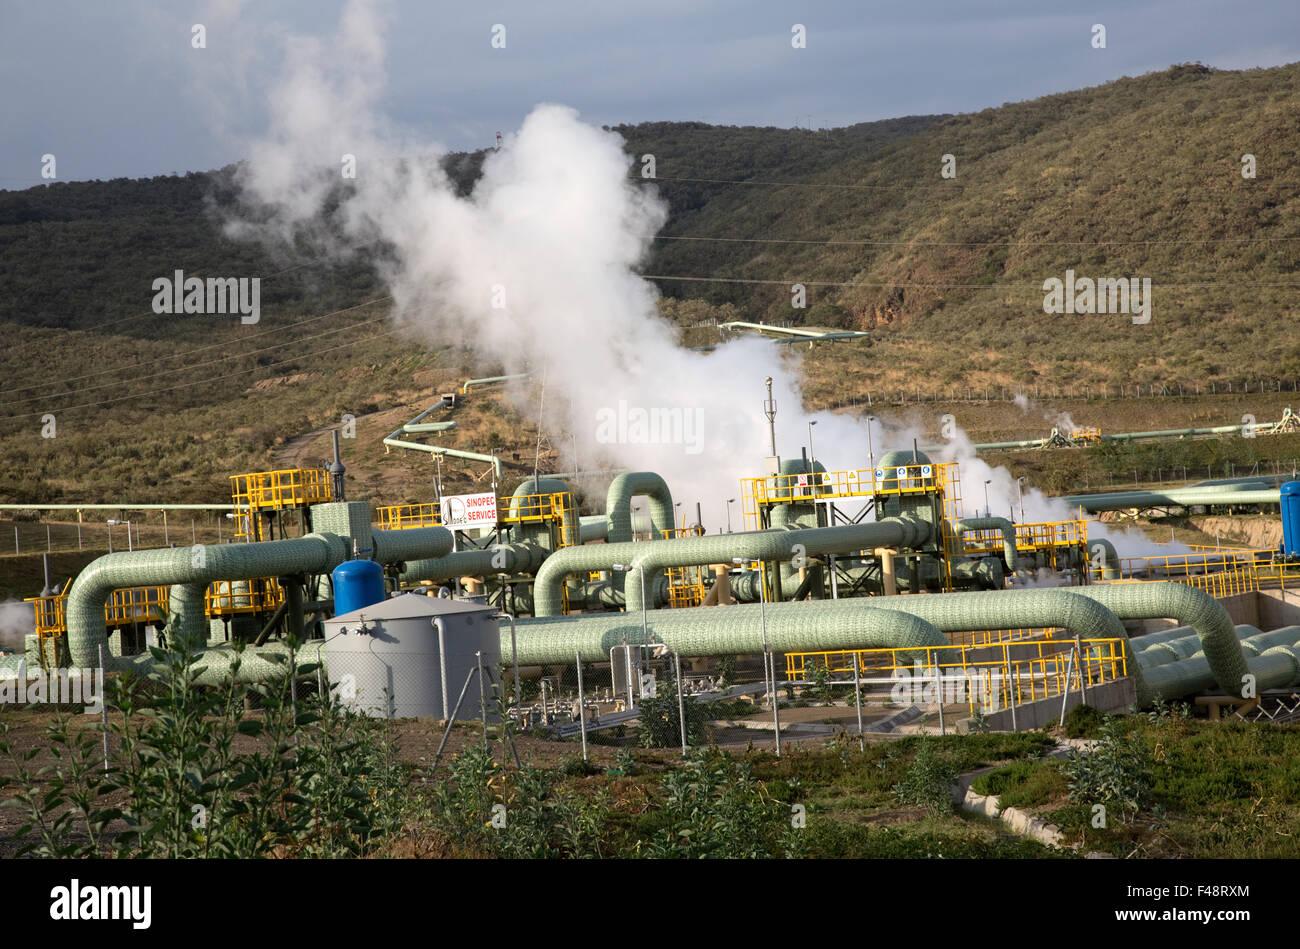 Olkaria 280MW geothermal energy plant Hell's Gate Rift Valley Kenya Stock Photo